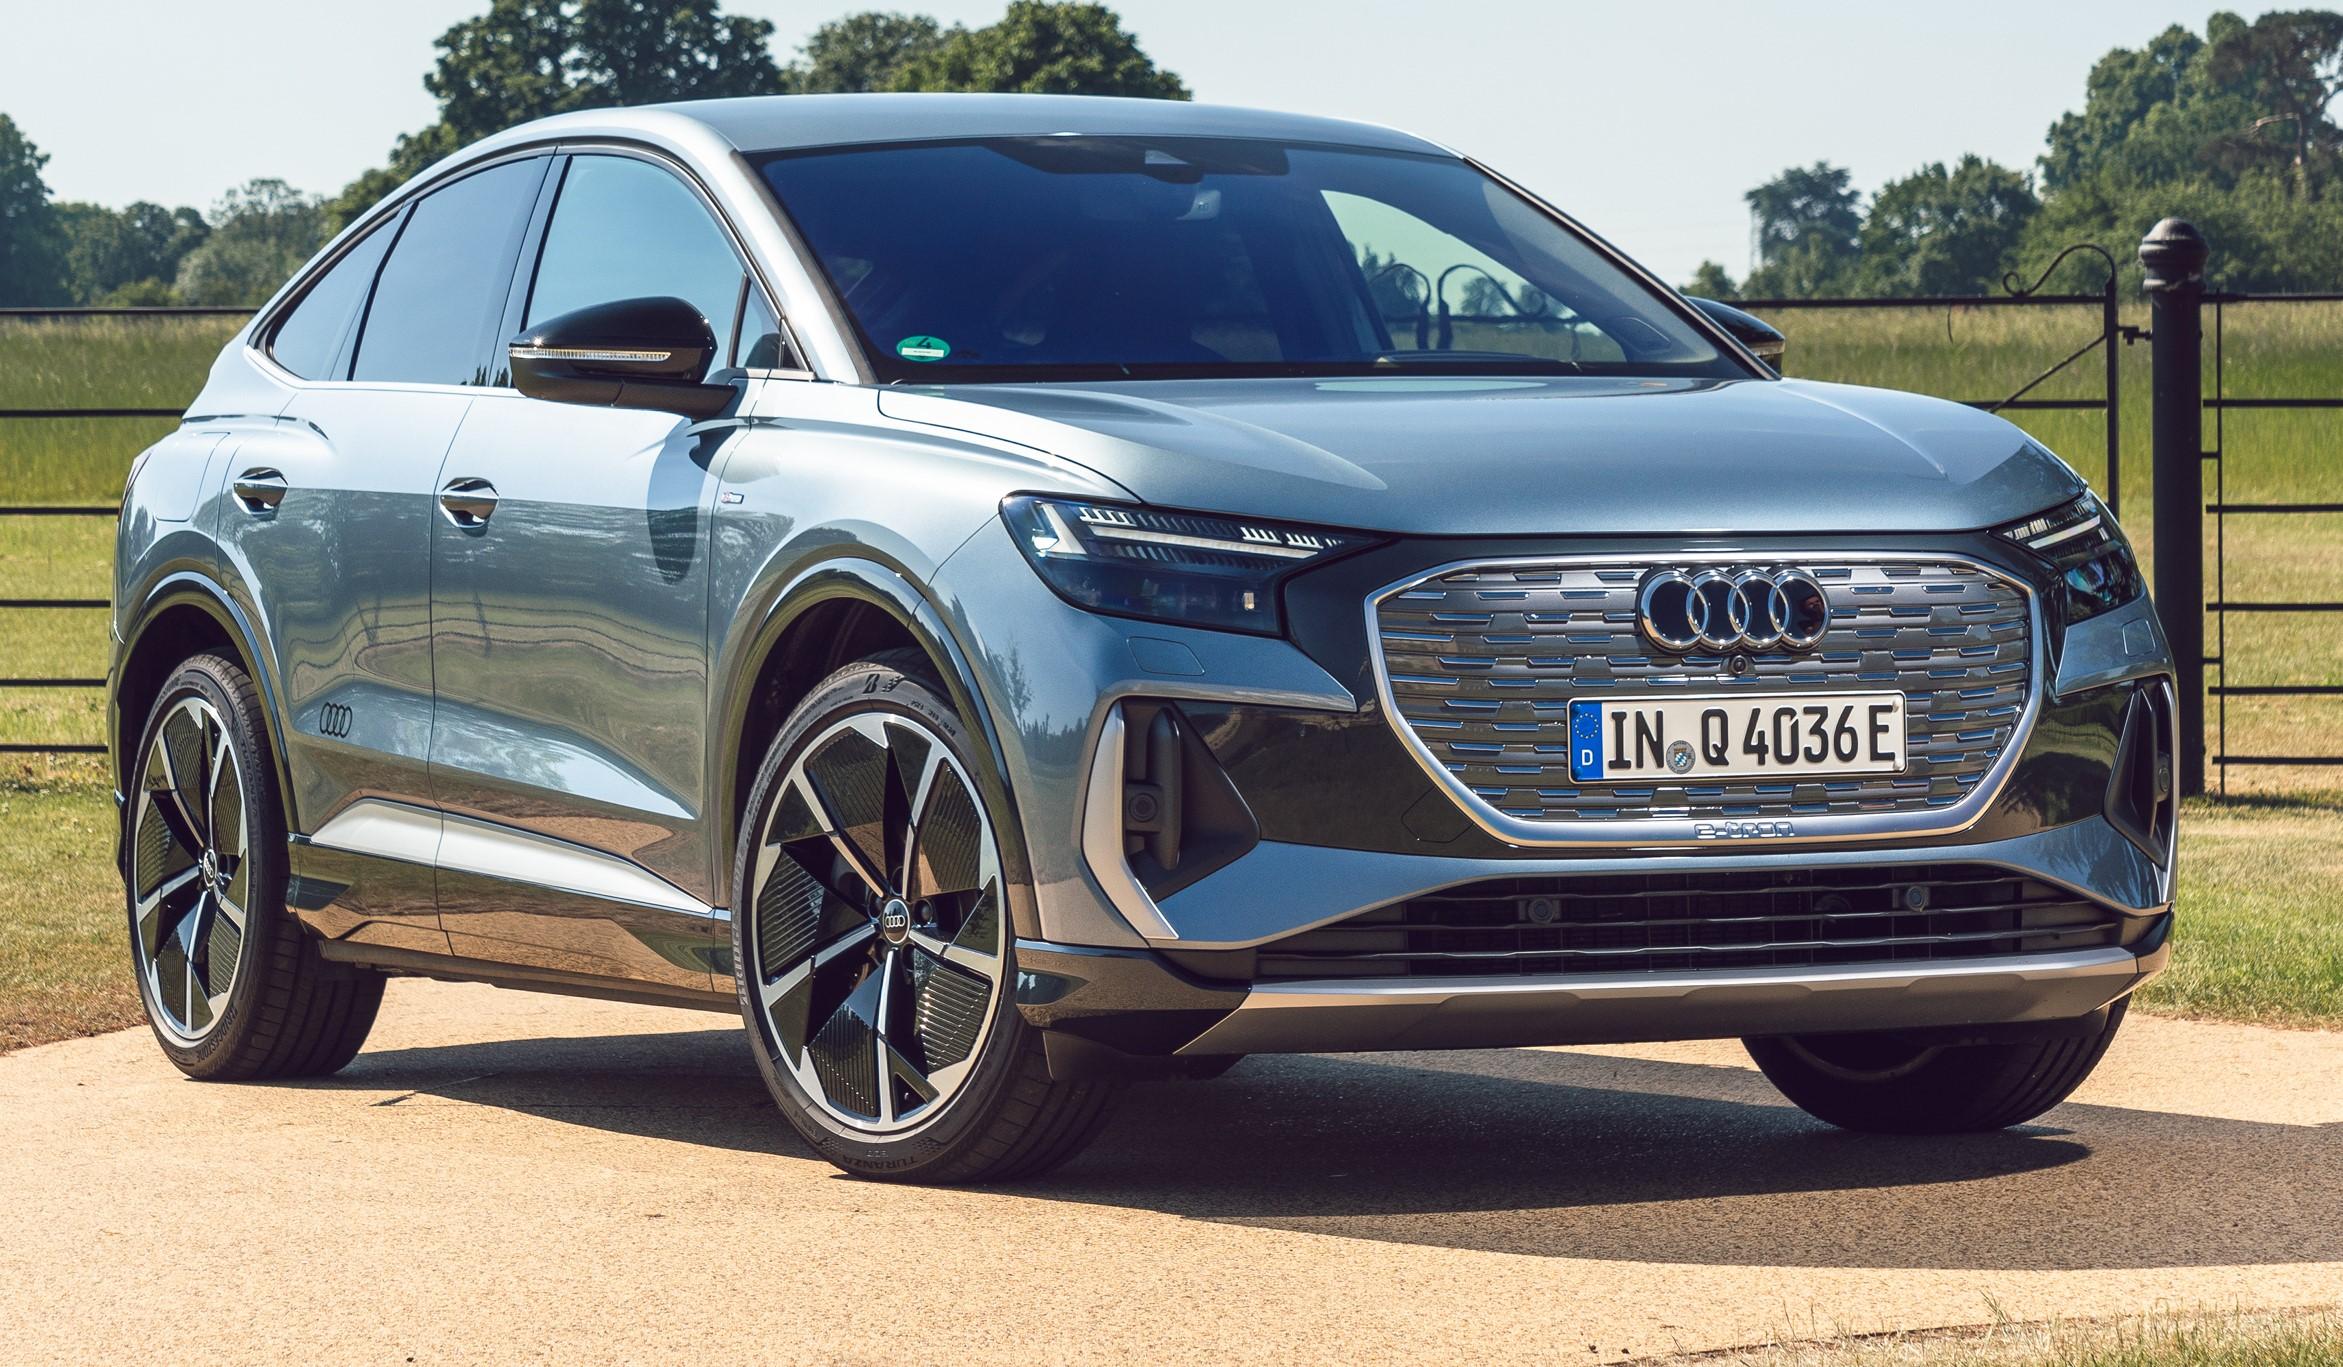 New Audi Q4 e-tron spec revealed